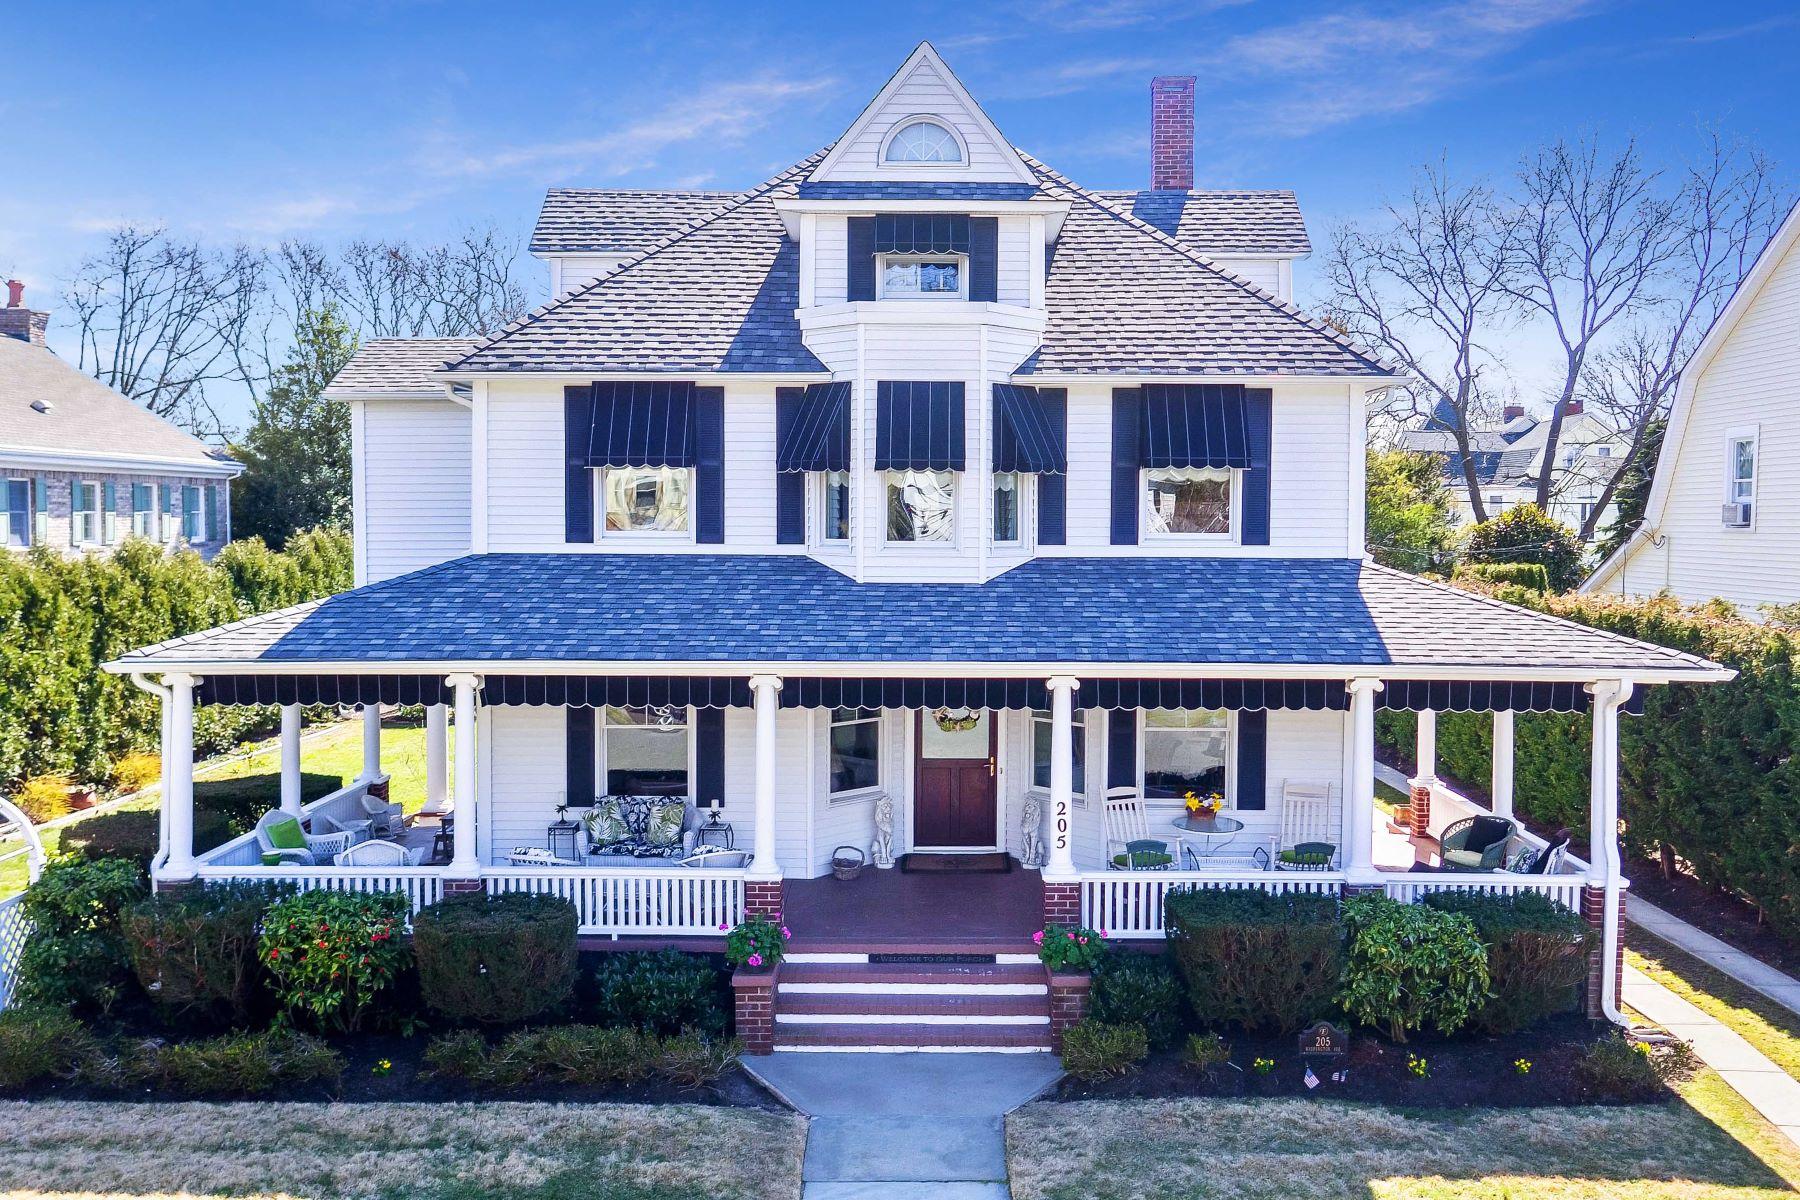 Villa per Vendita alle ore Wonderful on Washington 205 Washington Spring Lake, New Jersey, 07762 Stati Uniti